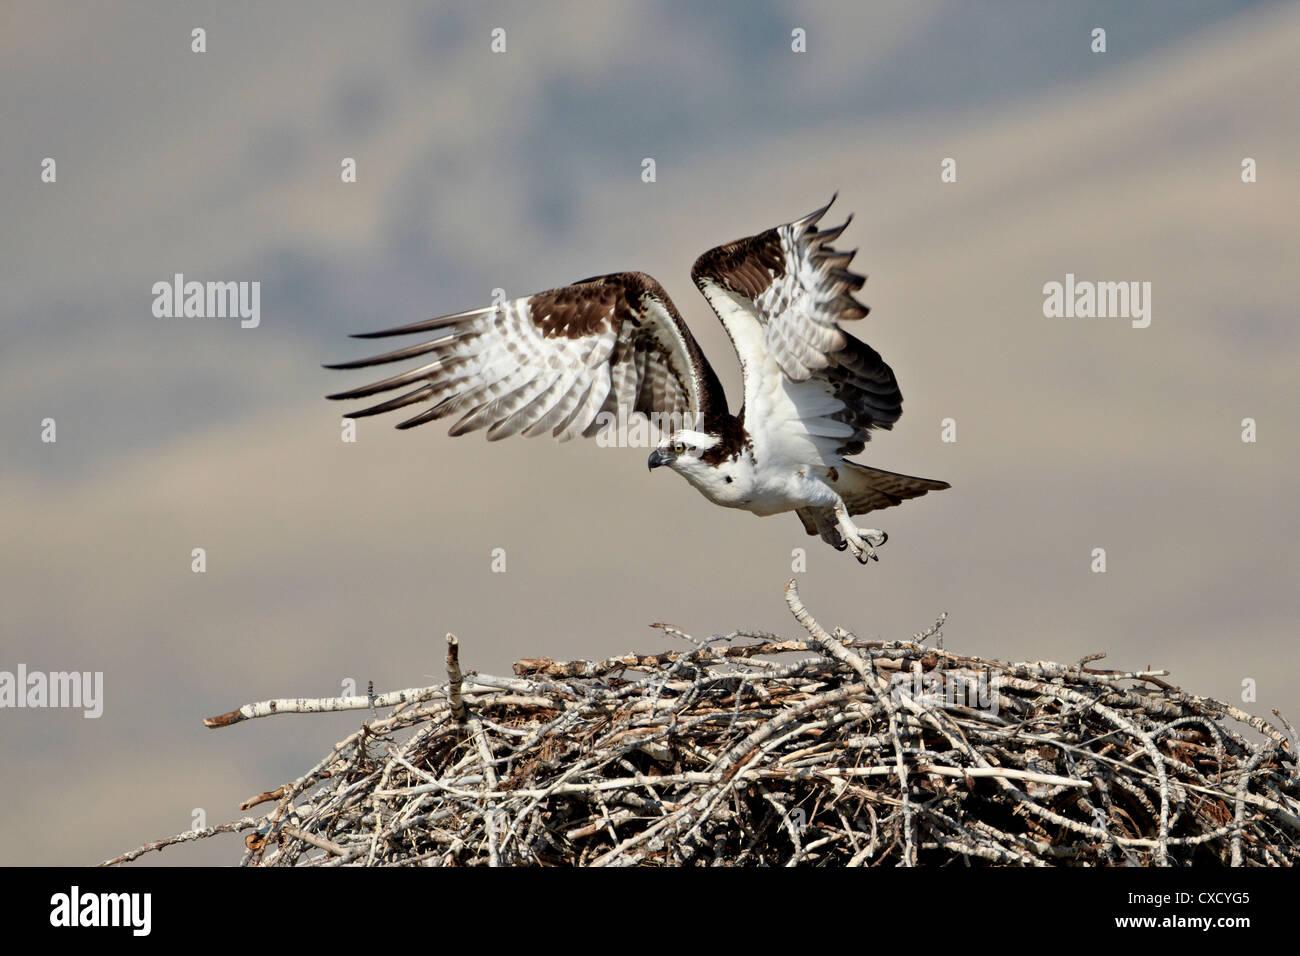 Osprey (Pandion haliaetus) taking off from its nest, Lemhi County, Idaho, United States of America, North America - Stock Image